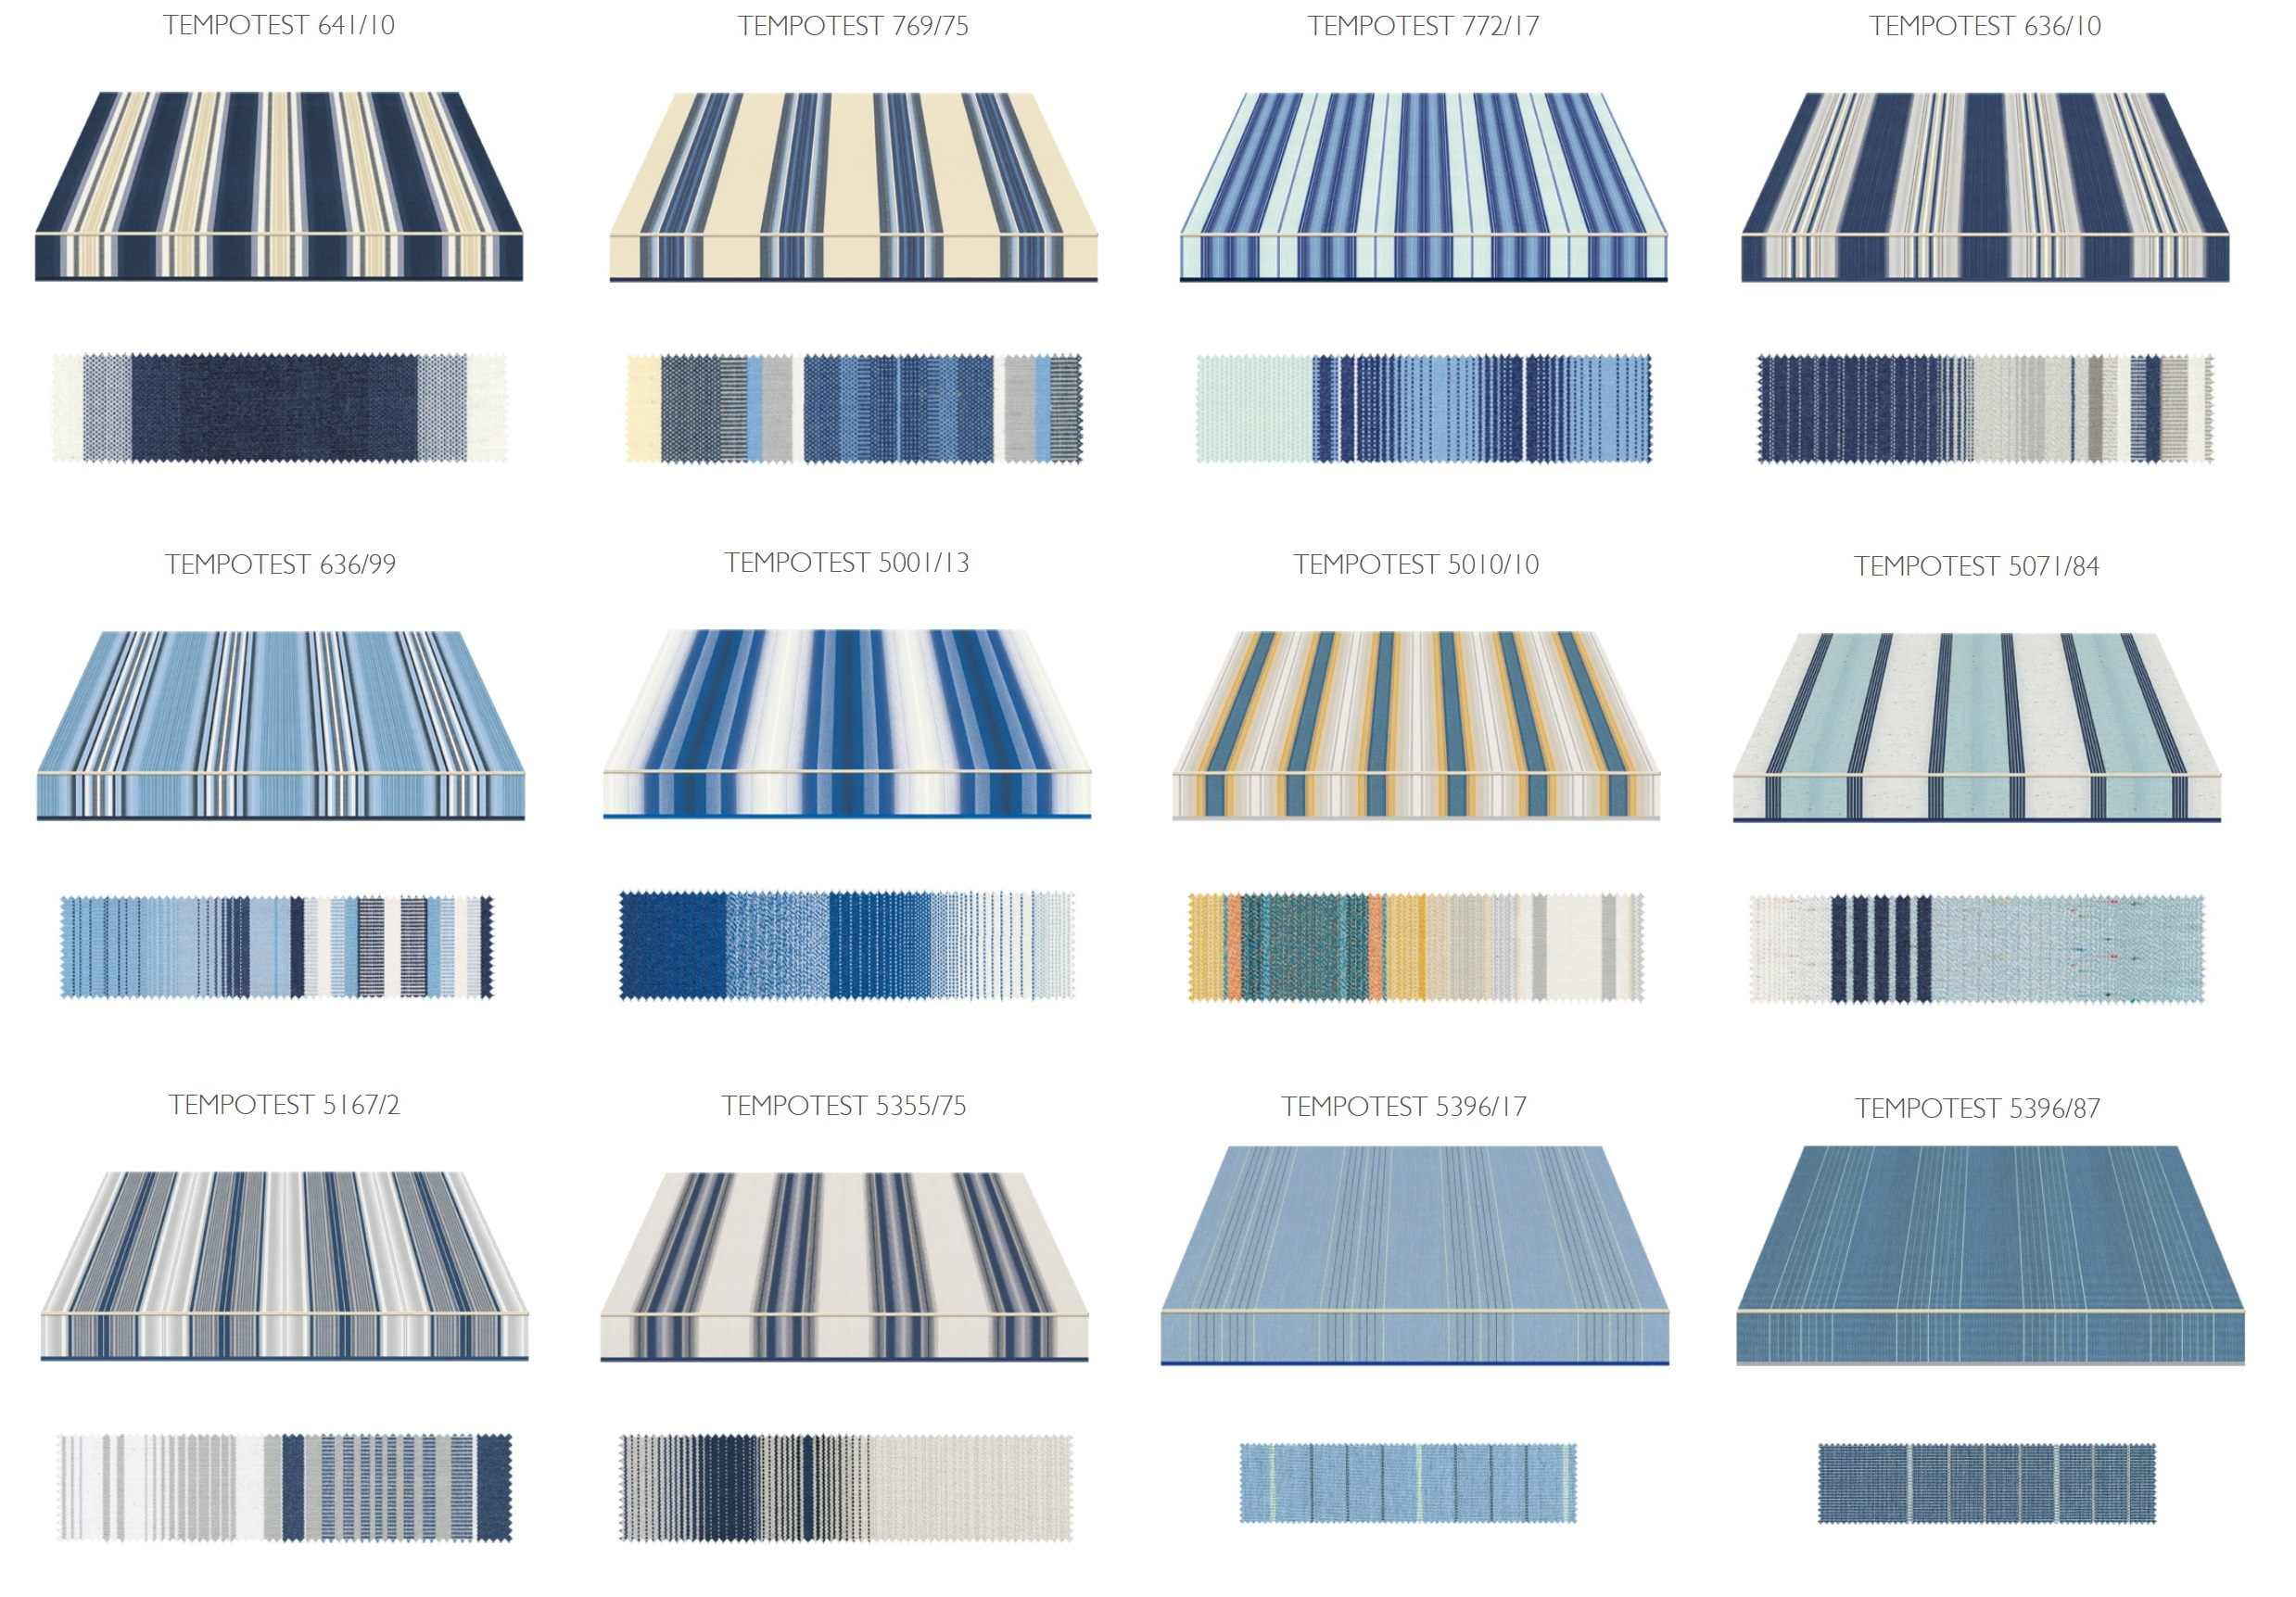 plavi komplet boja za tende Adistrum